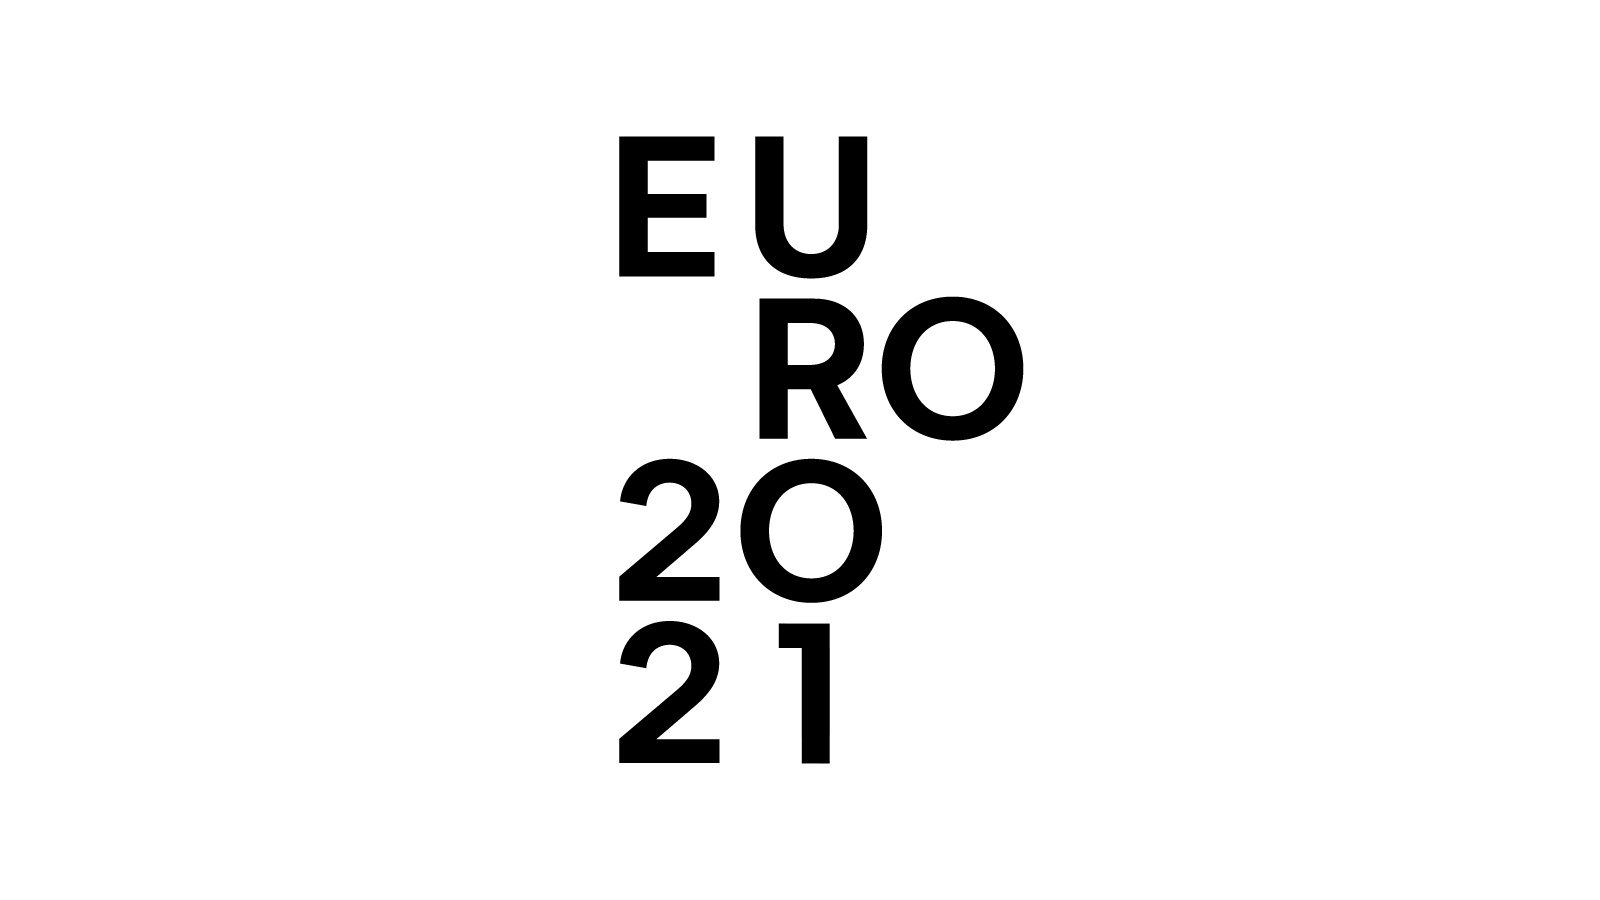 typography-poster-design-football-milton-keynes-london